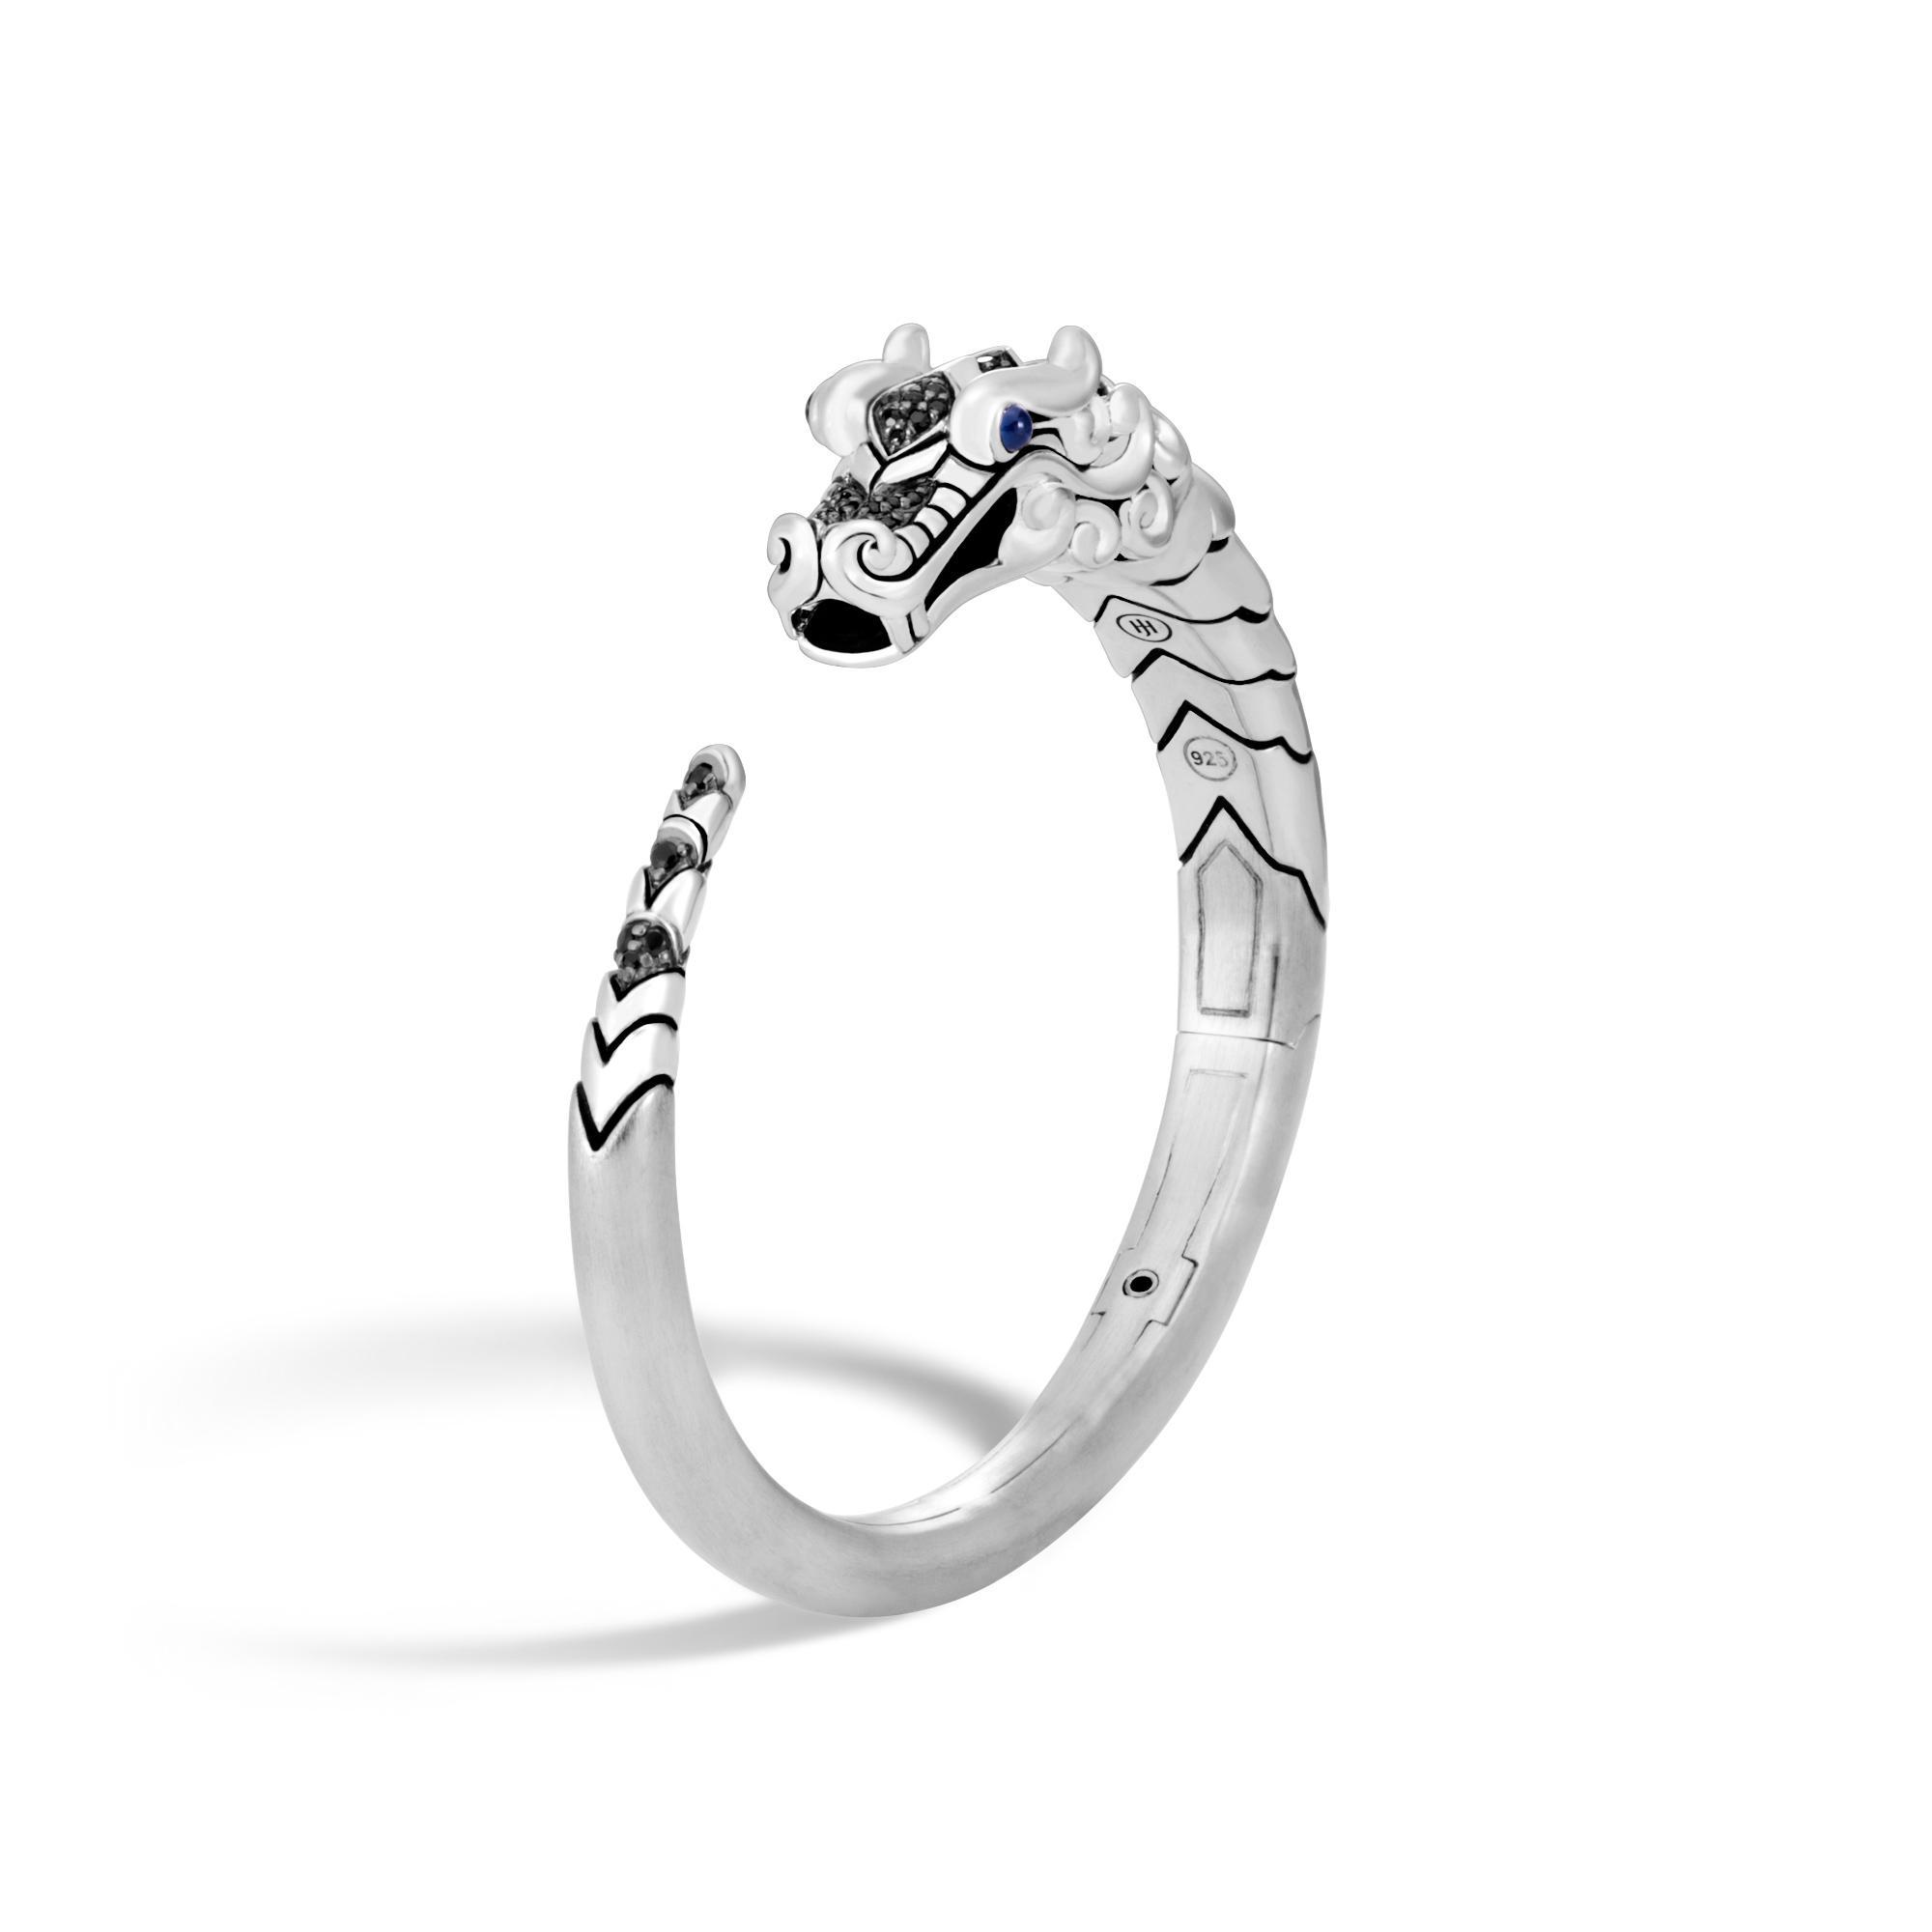 John Hardy Naga Brushed Ring With Black Sapphire, Black Spinel